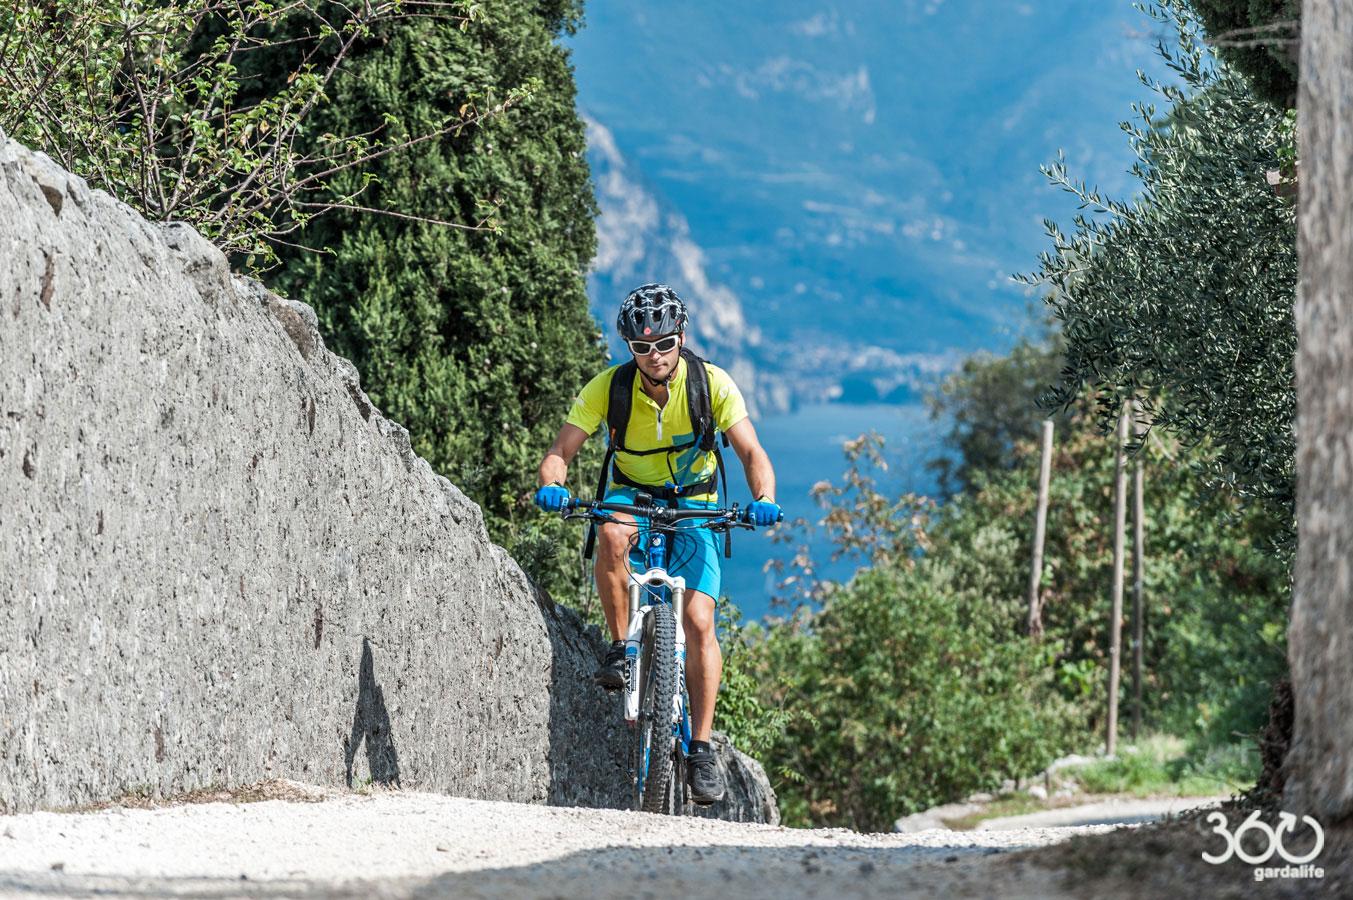 Biking In Malcesine And Monte Baldo At Lake Garda